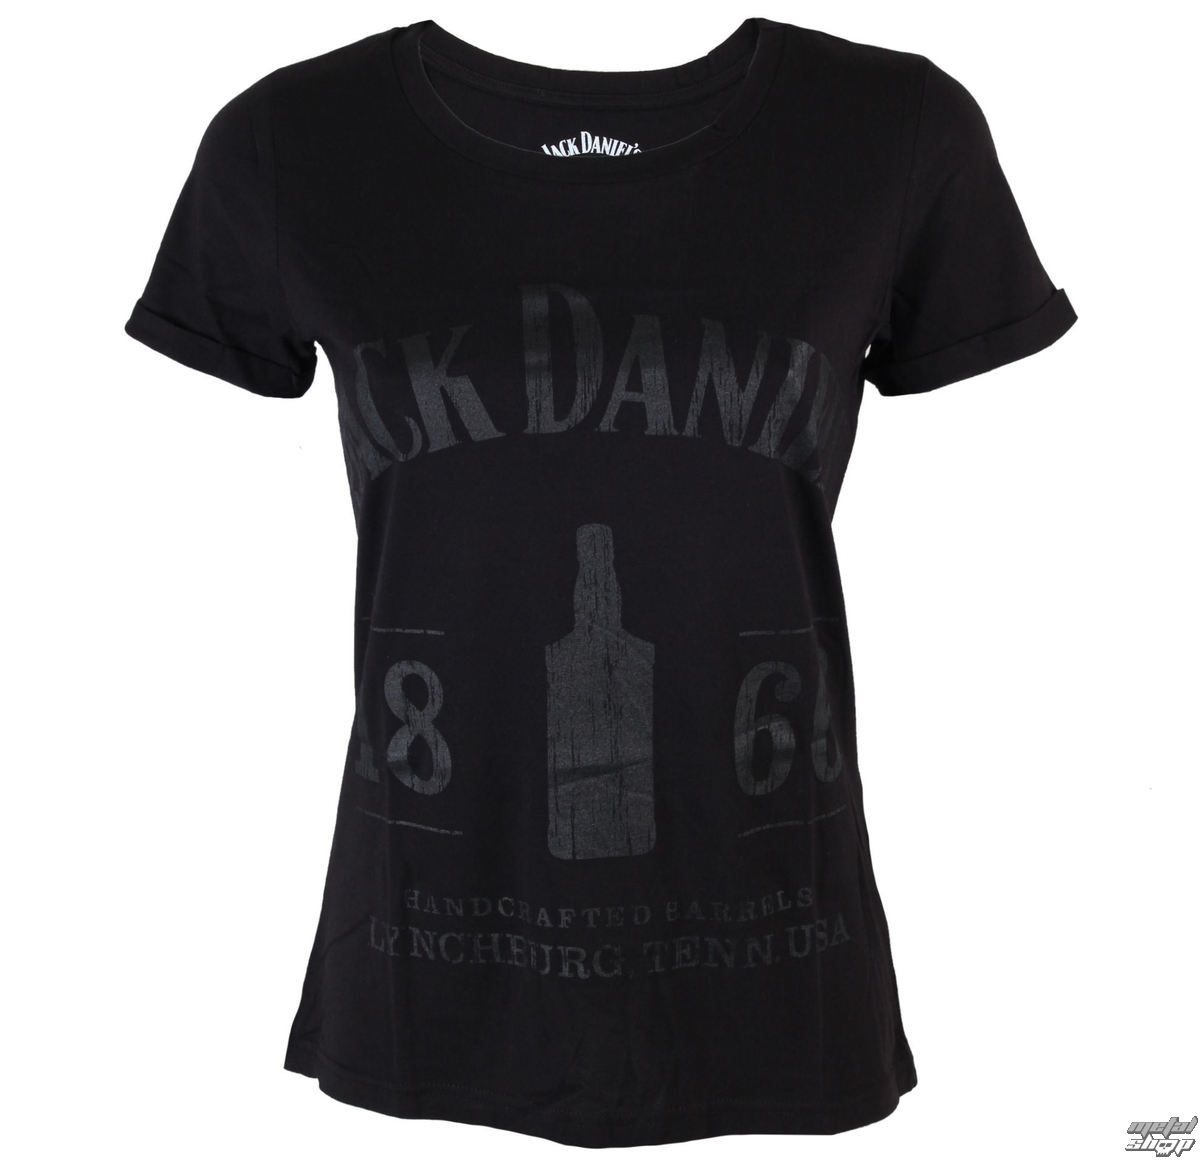 tričko dámské Jack Daniels - 1866 - Black - TS530609JDS